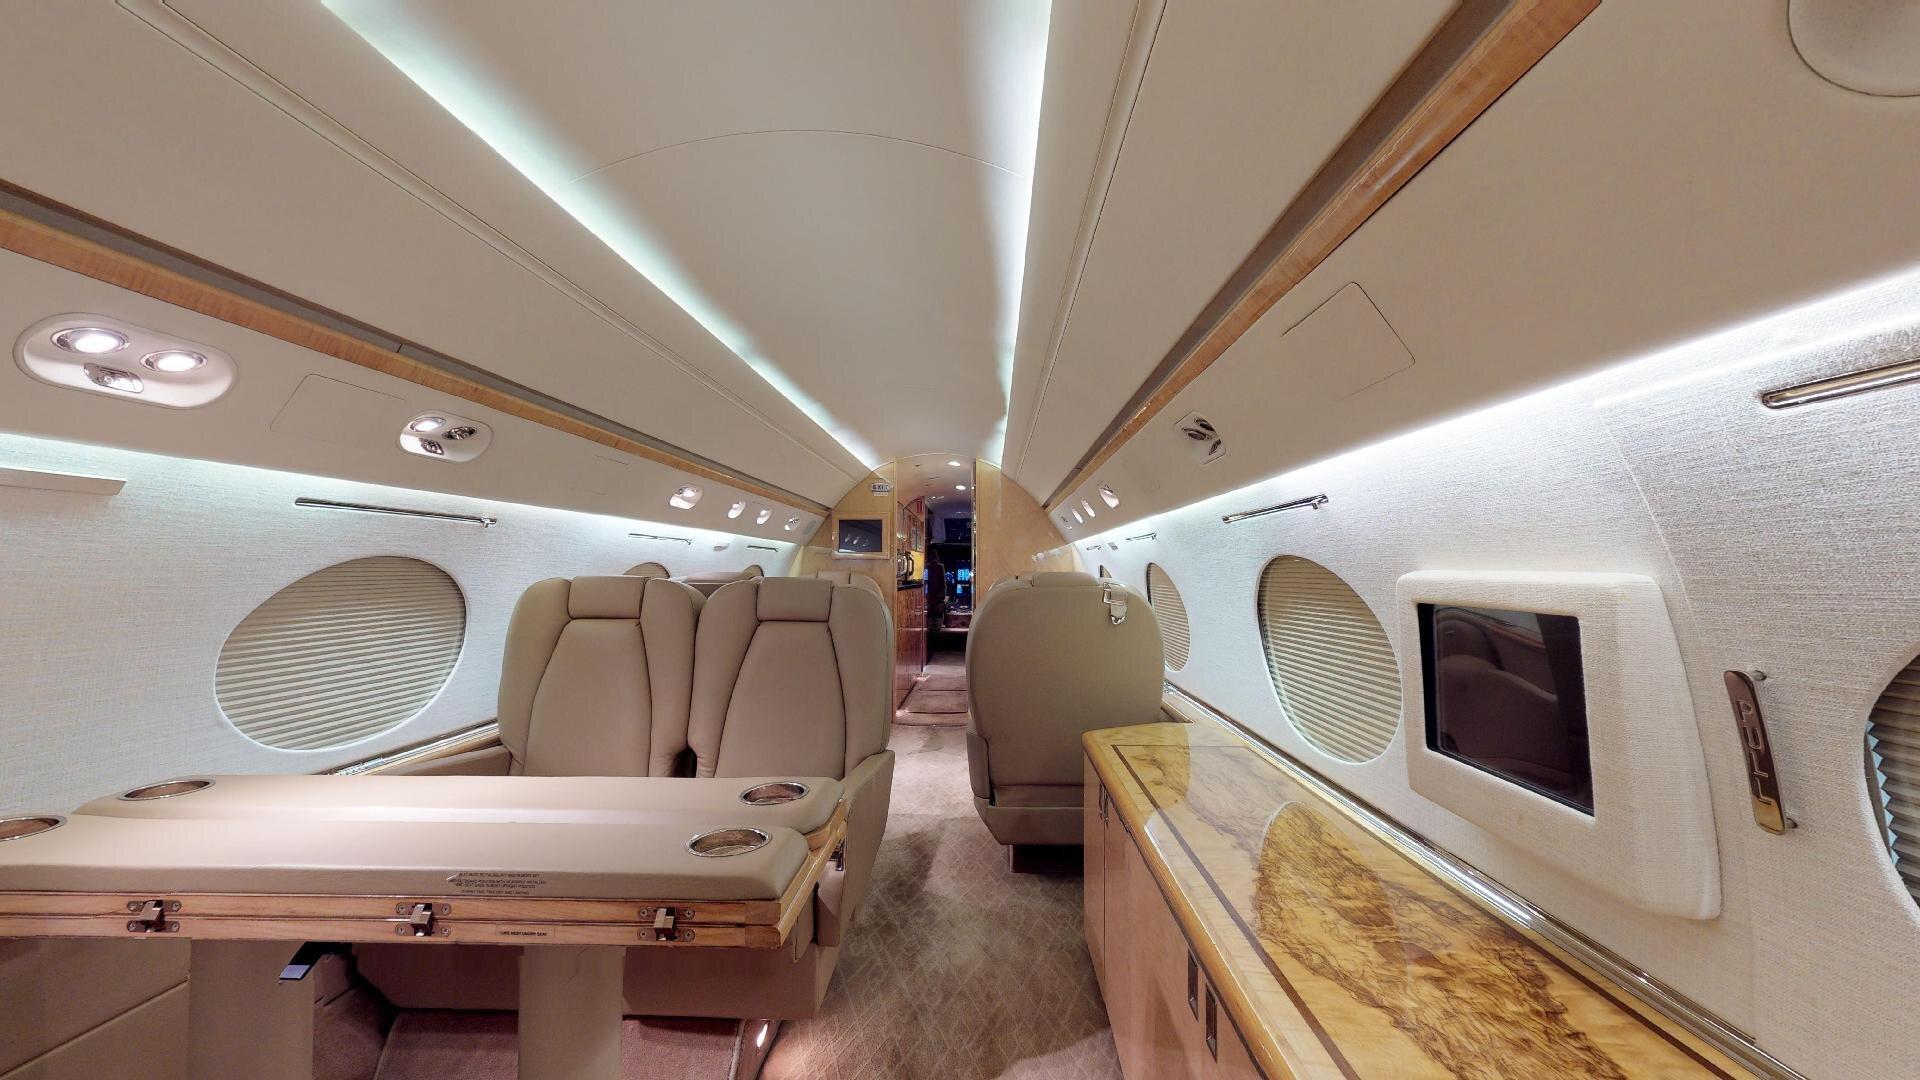 Gulfstream-V-SN-518-09232019_131953.jpg